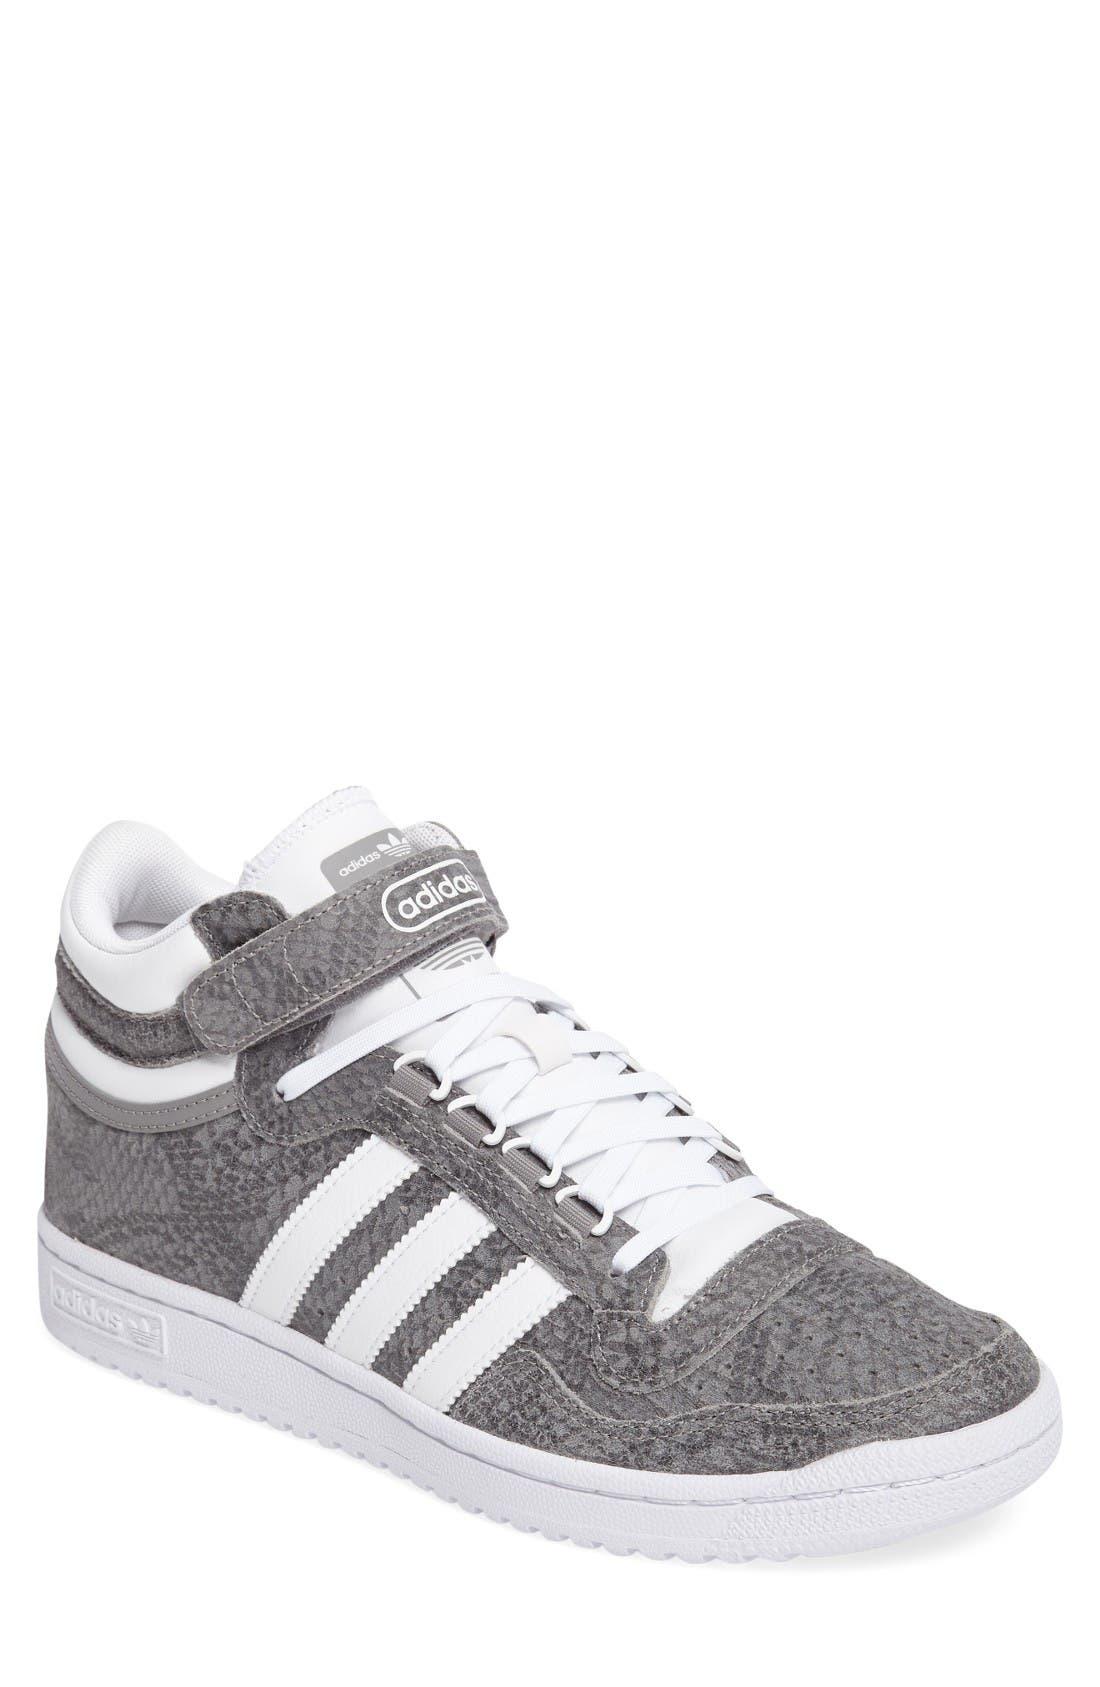 Main Image - adidas Concord 2.0 Mid Sneaker (Women)